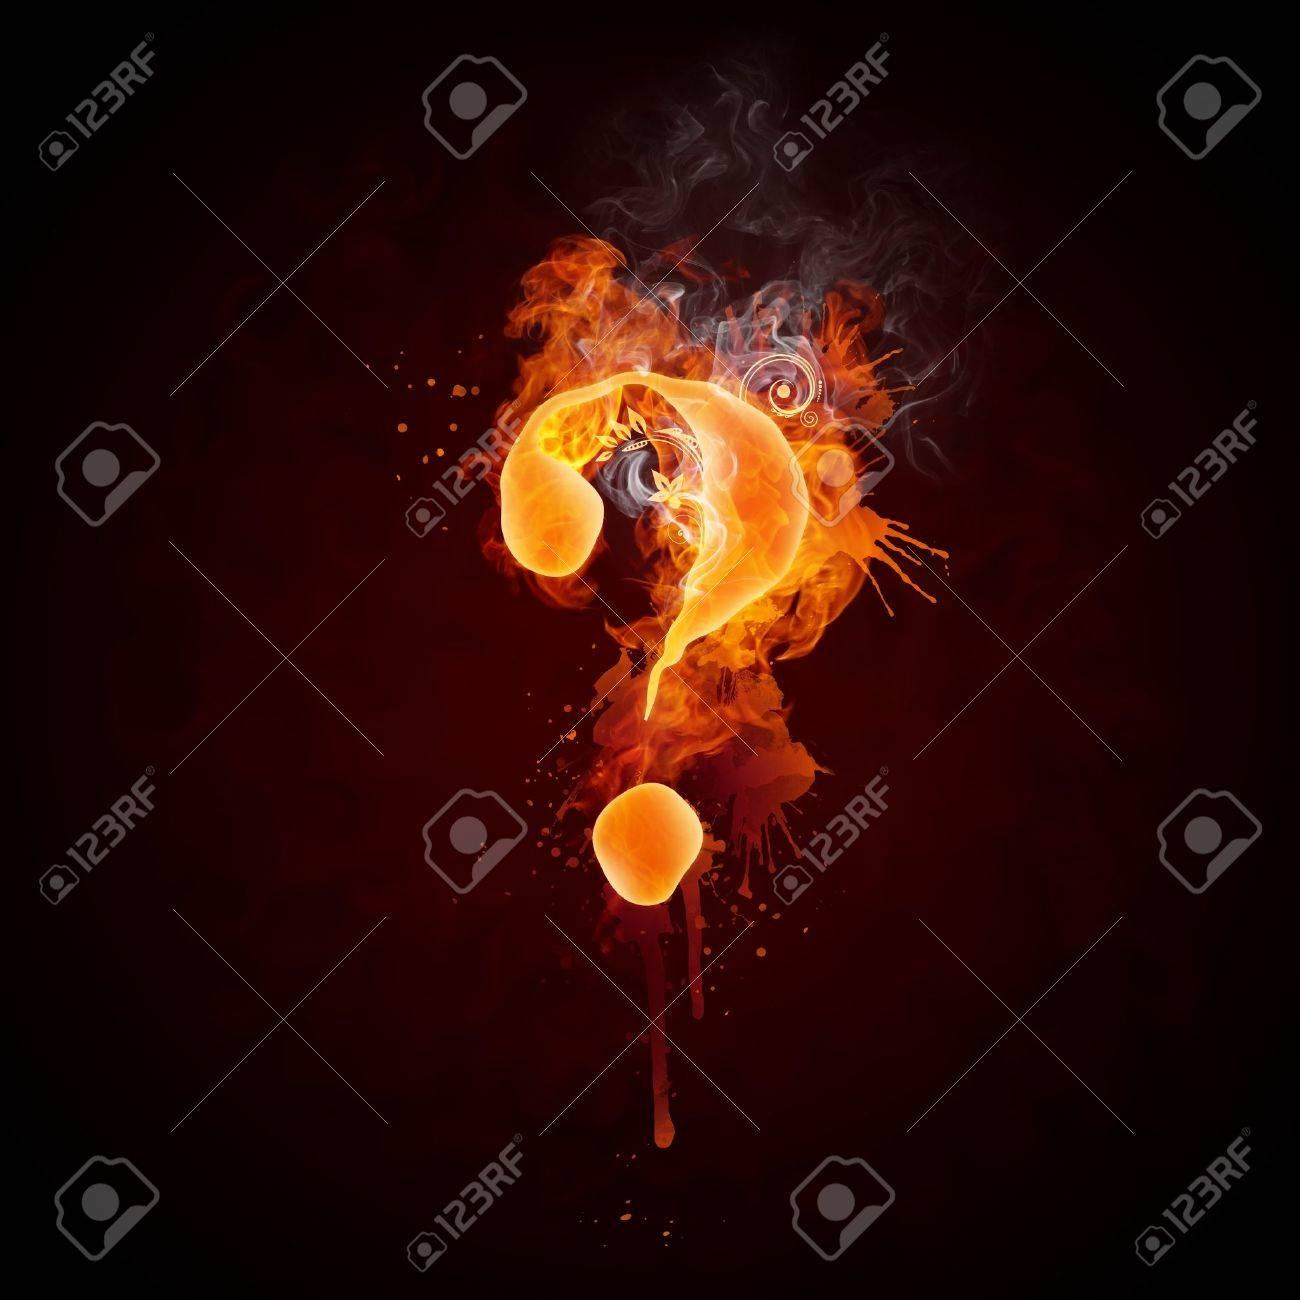 Fire Swirl Question Mark Stock Photo - 9366117